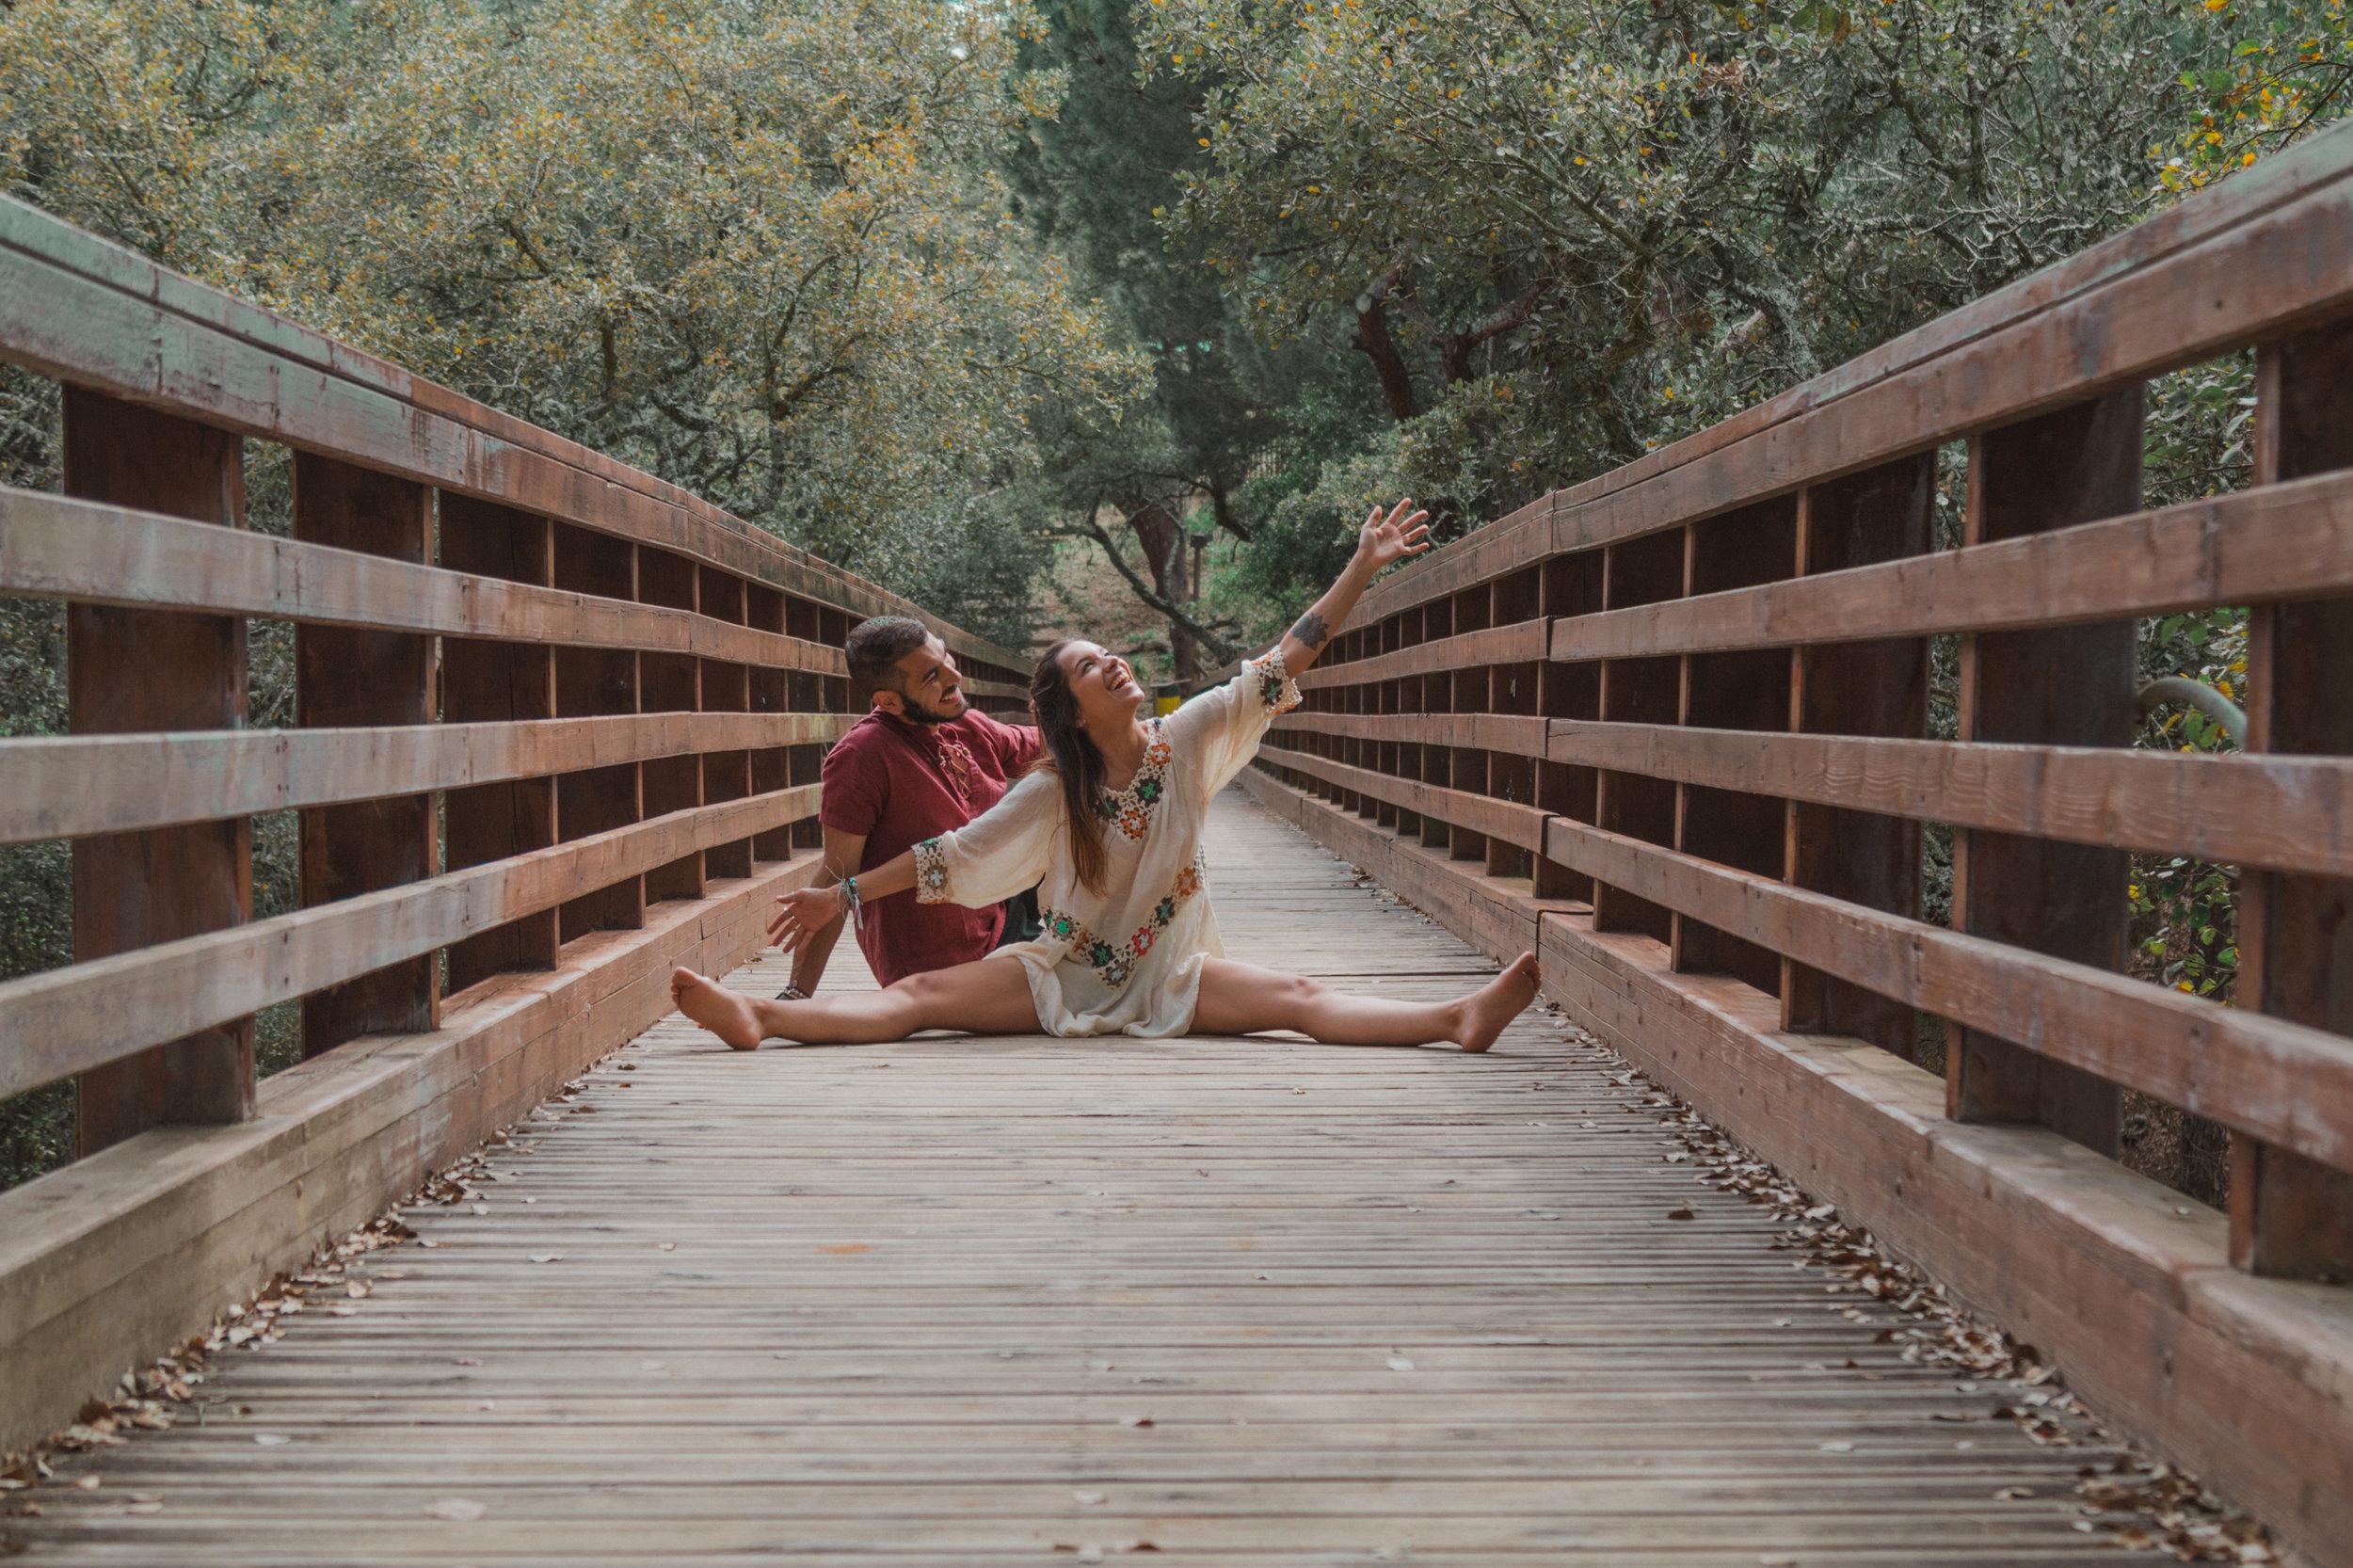 freeoversea at badoca safari park travel couple portugal alentejo wood brige photos explore nature